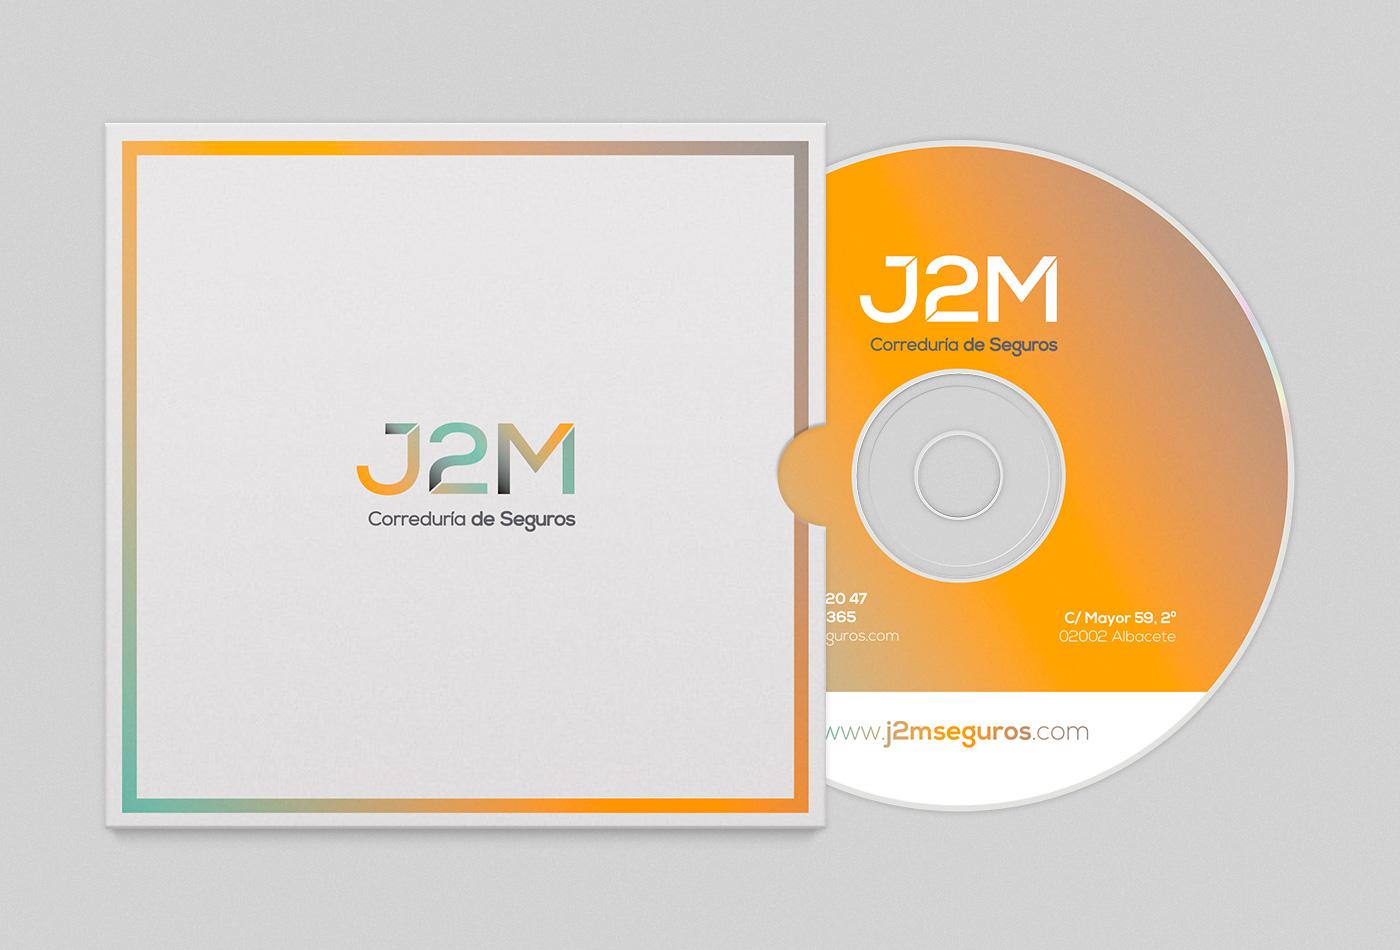 Cd imagen corporativa, Diseño grafico Albacete, branding Albacete, impresión tarjetas visita, J2M seguros